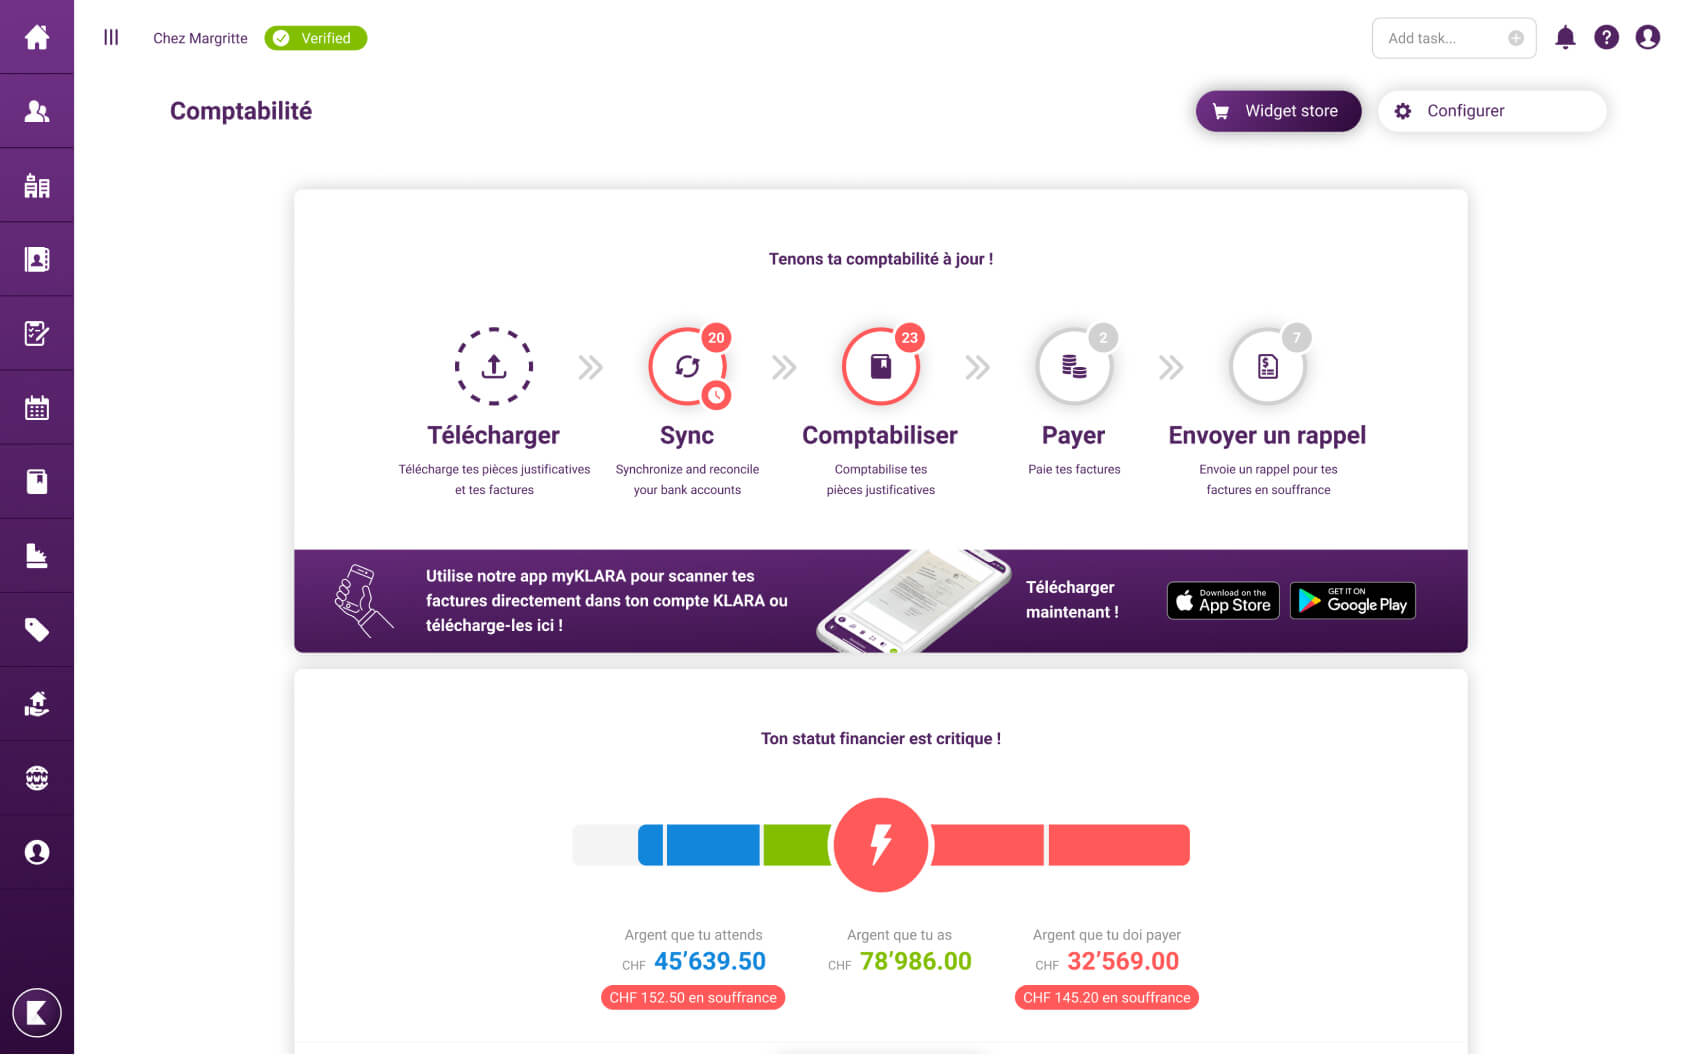 klara-gallery-screens-accounting-dashboard-fr